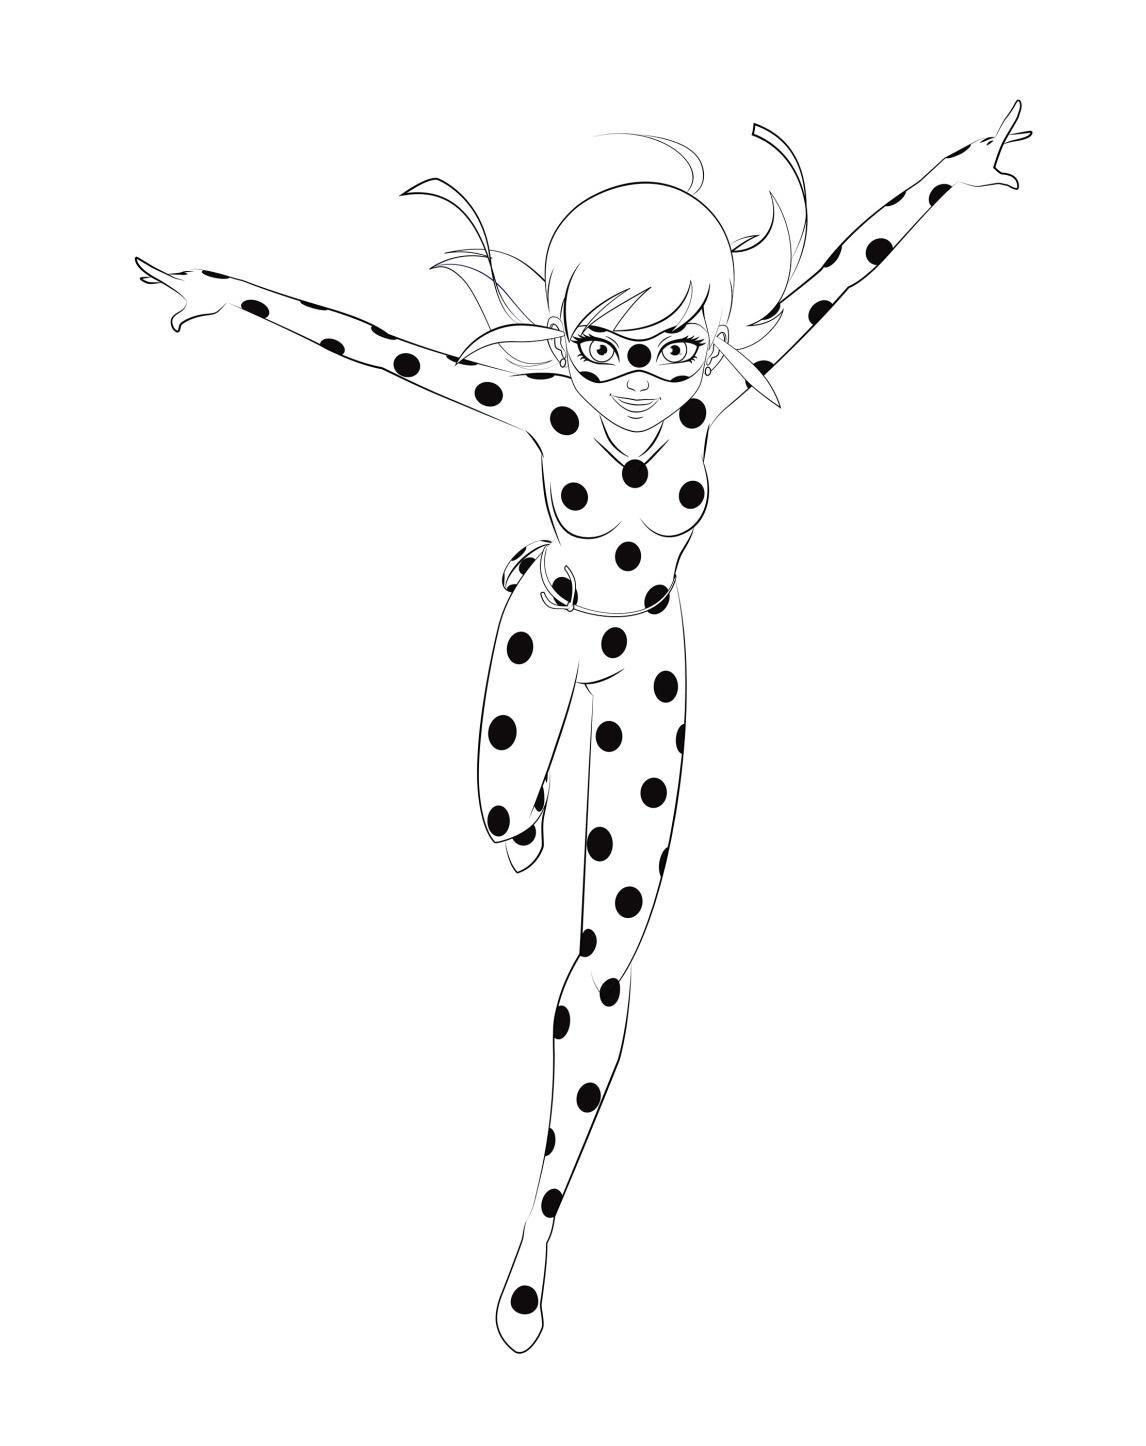 Miraculous Ladybug Coloring Page Boyama Sayfalari Kara Kedi Resim